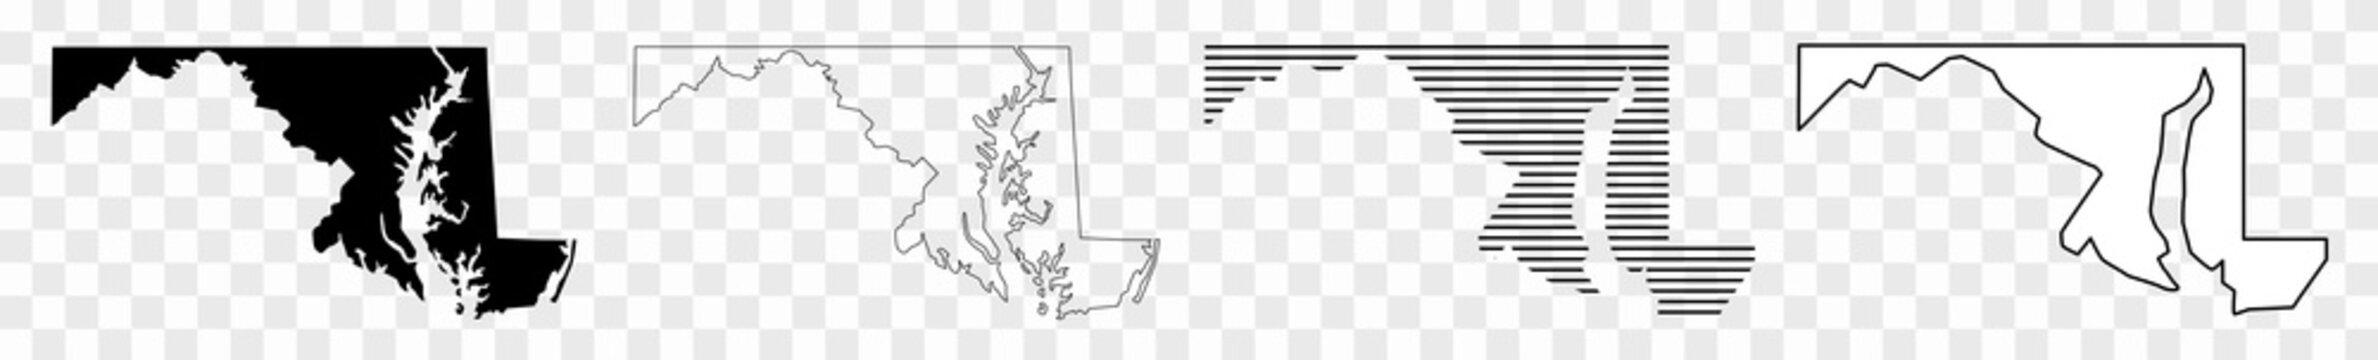 Maryland Map Black | State Border | United States | US America | Transparent Isolated | Variations